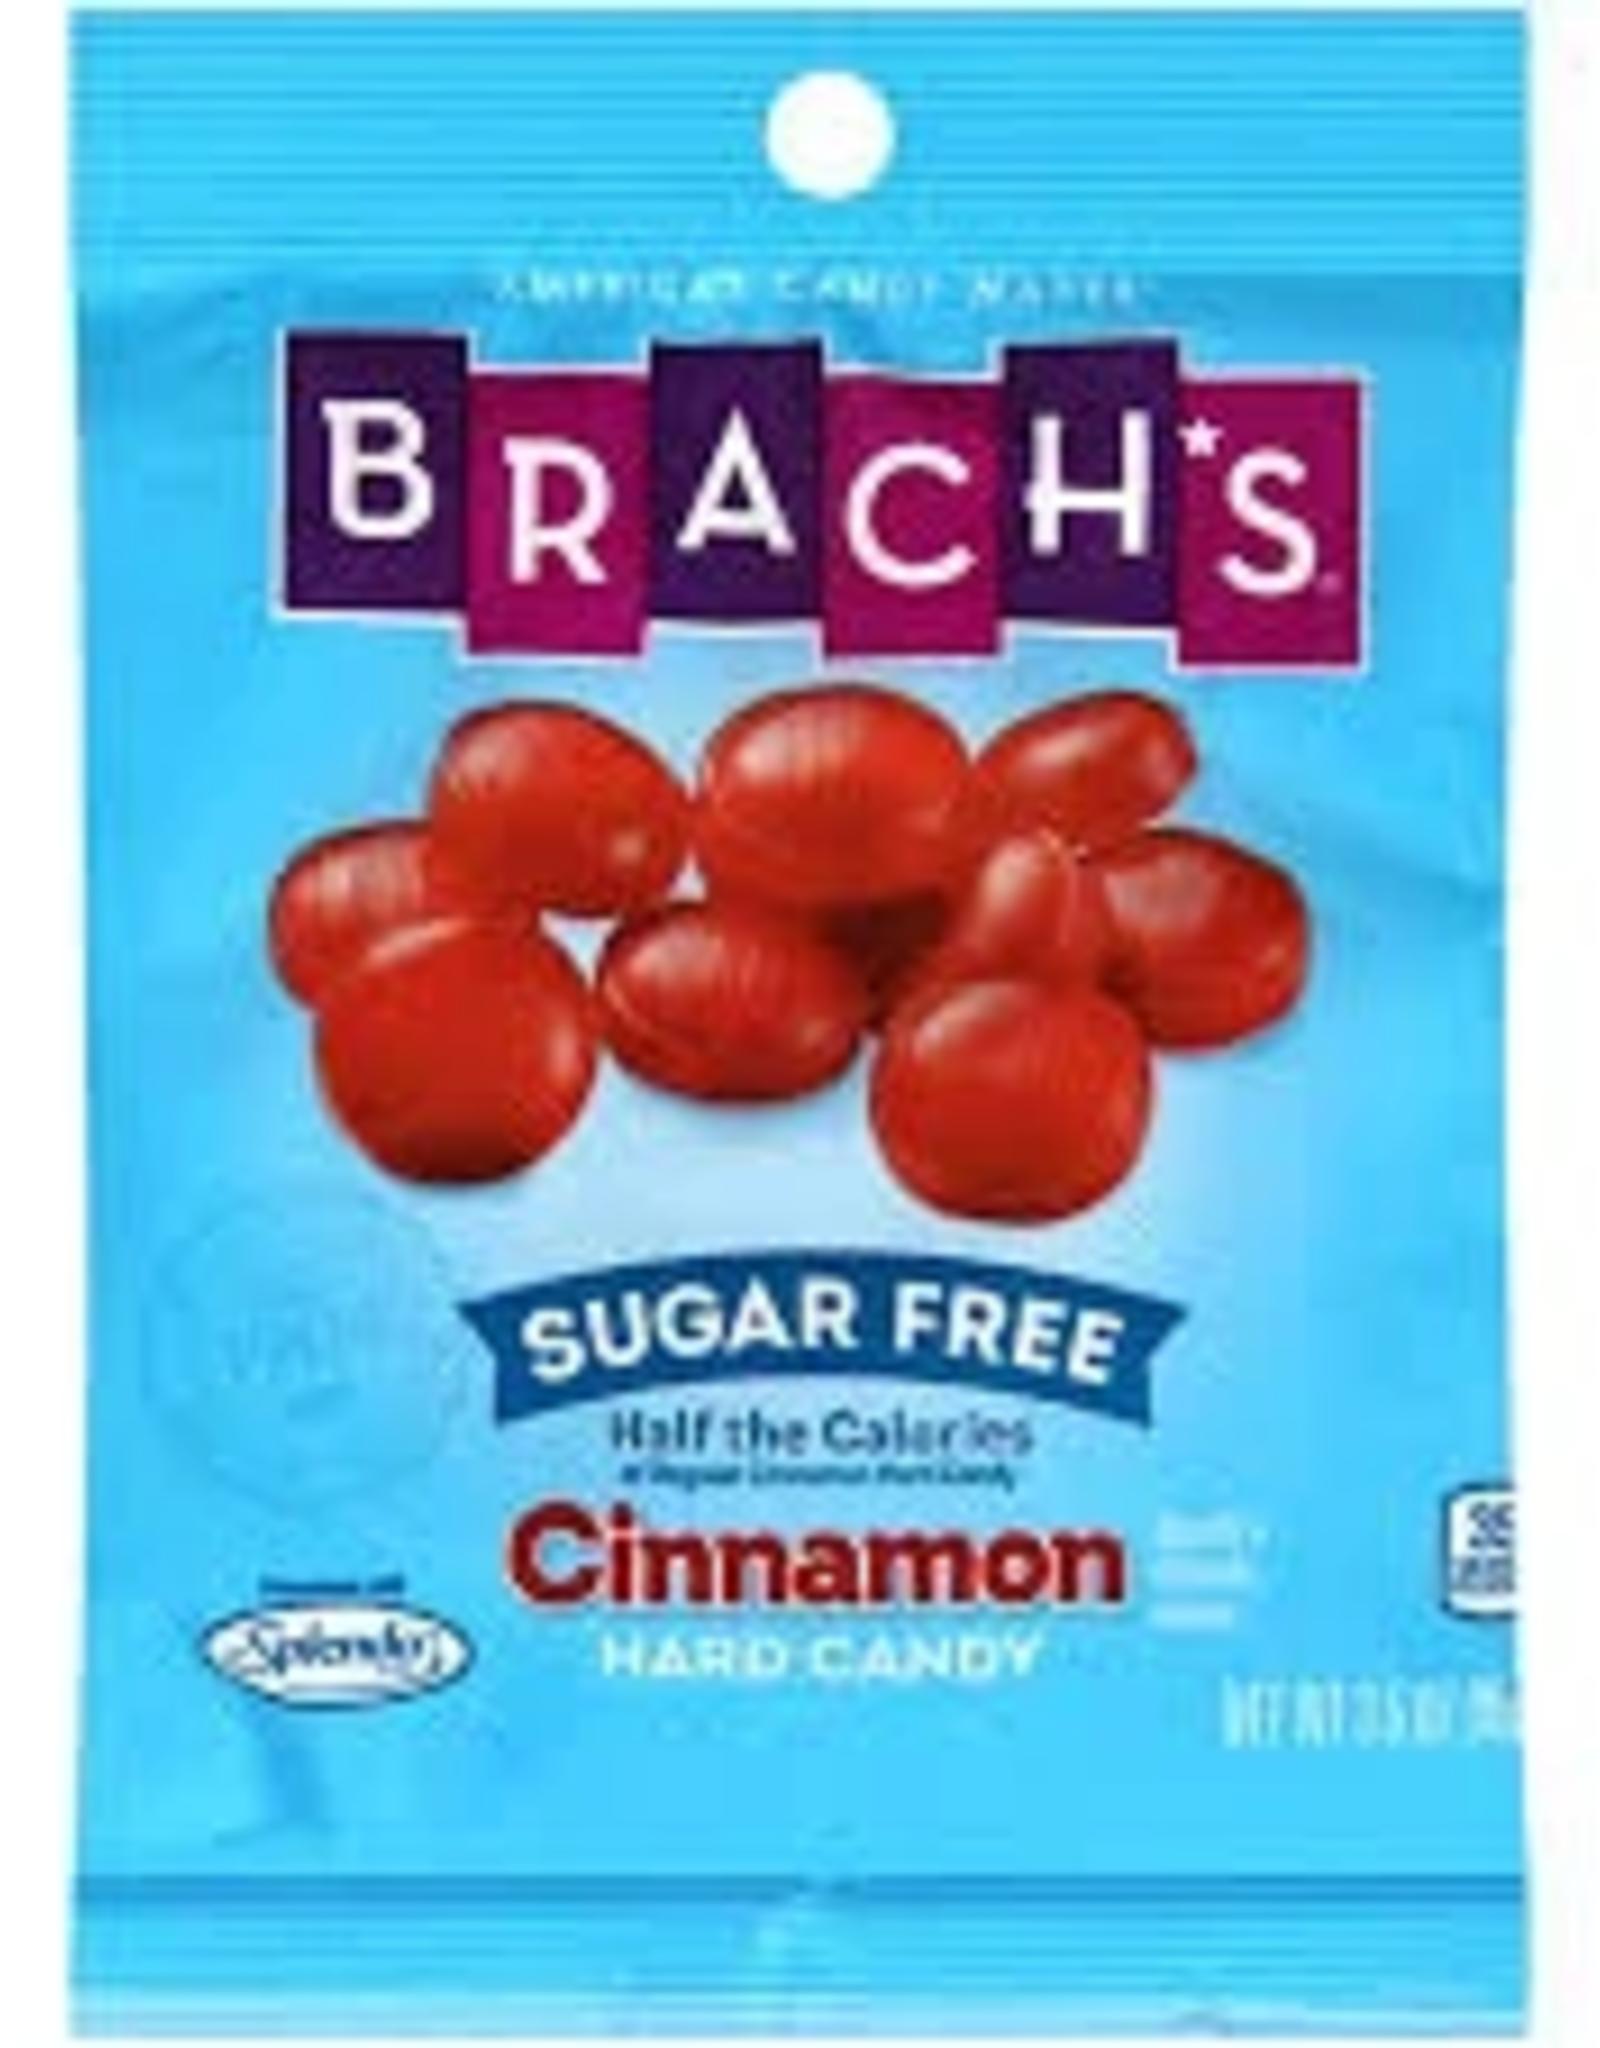 BRACH'S SUGAR FREE CINNAMON DISKS